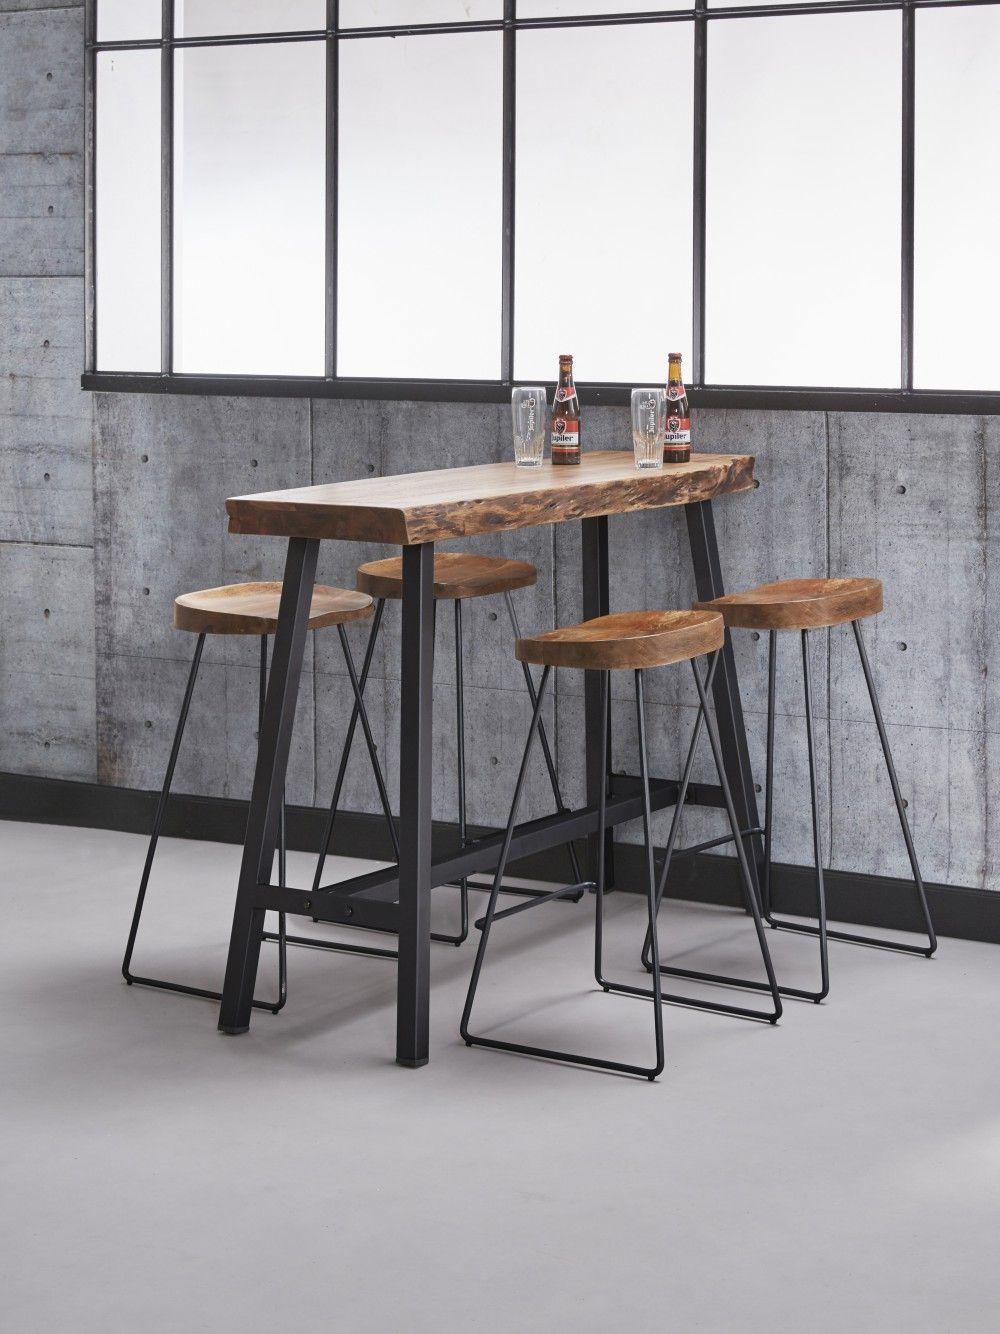 Barhocker Industrie Holz Schale Hocker Metall Industriedesign